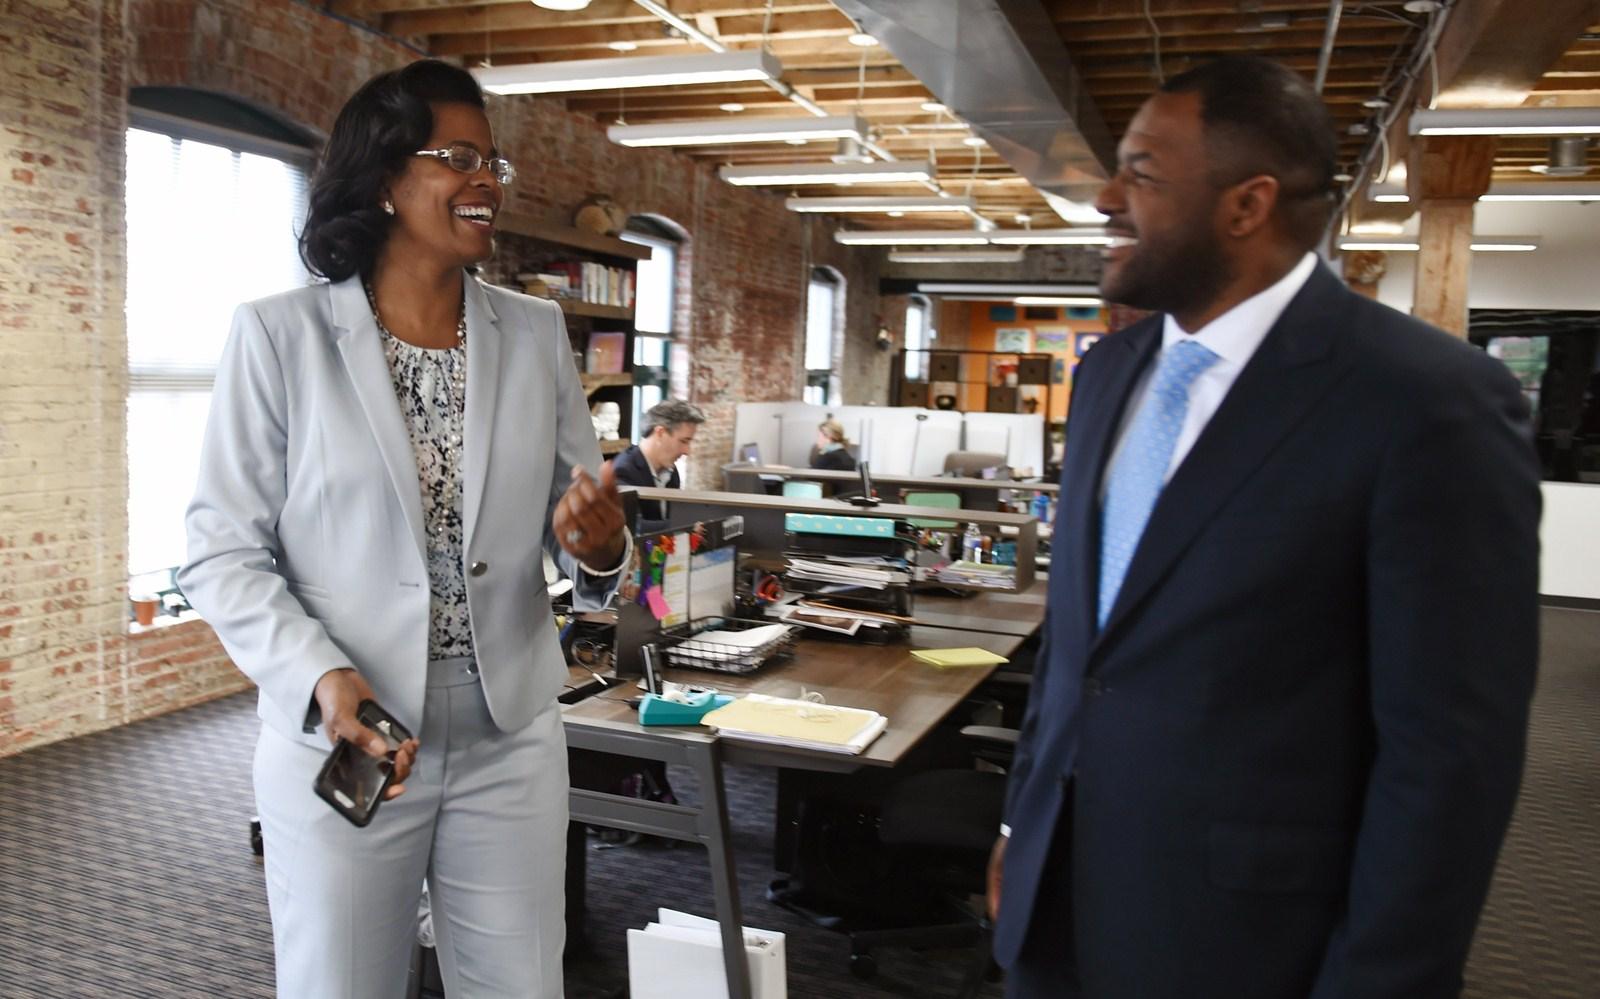 Santelises set to demand success - Baltimore Sun